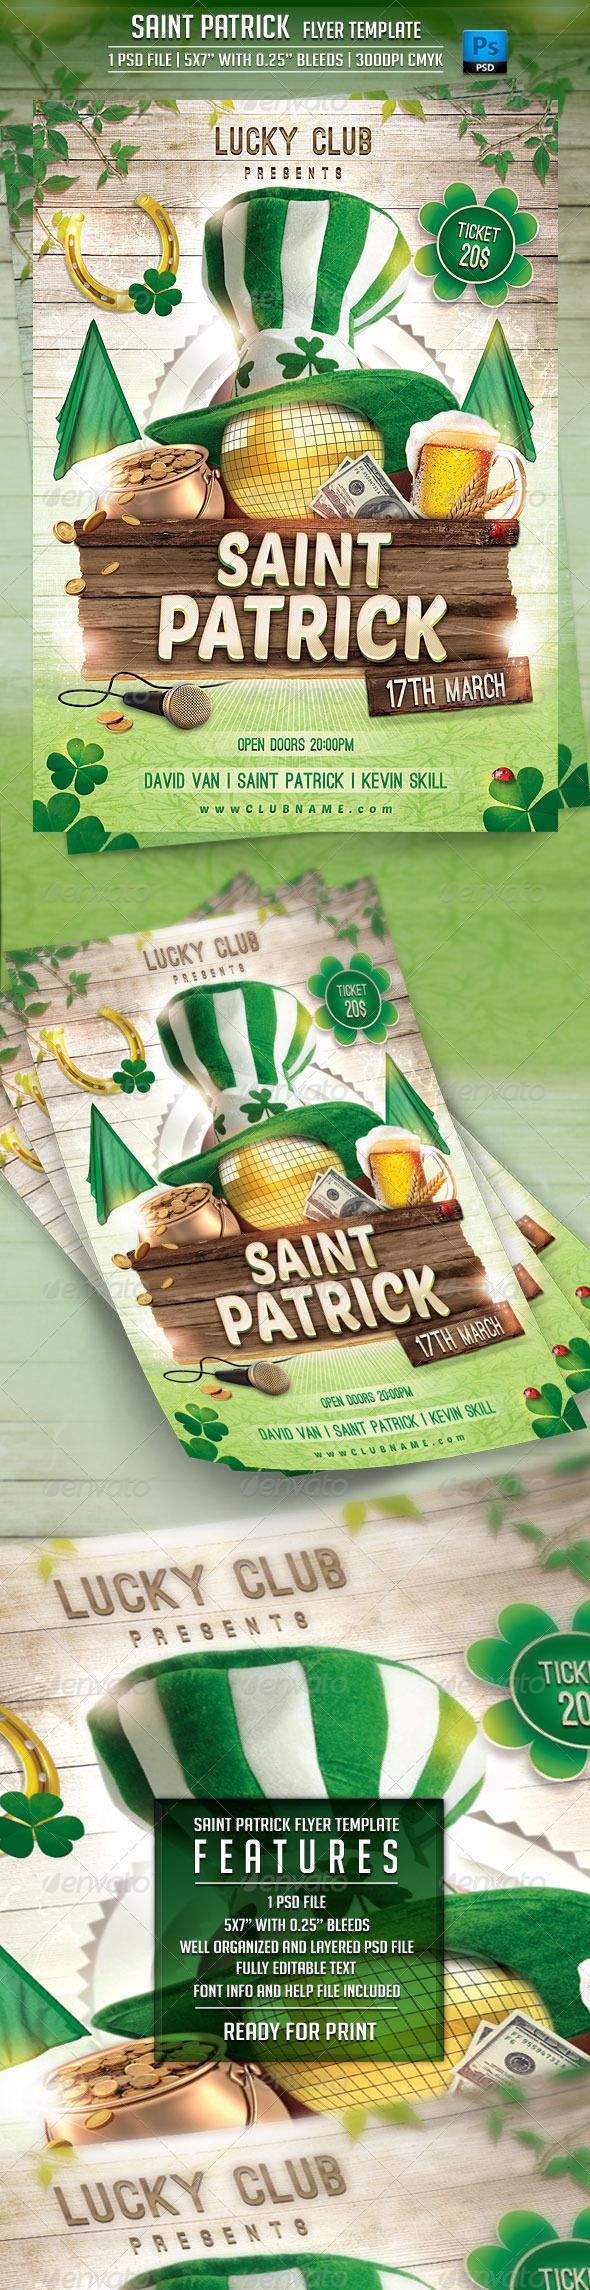 Saint Patrick Flyer Template - Events Flyers